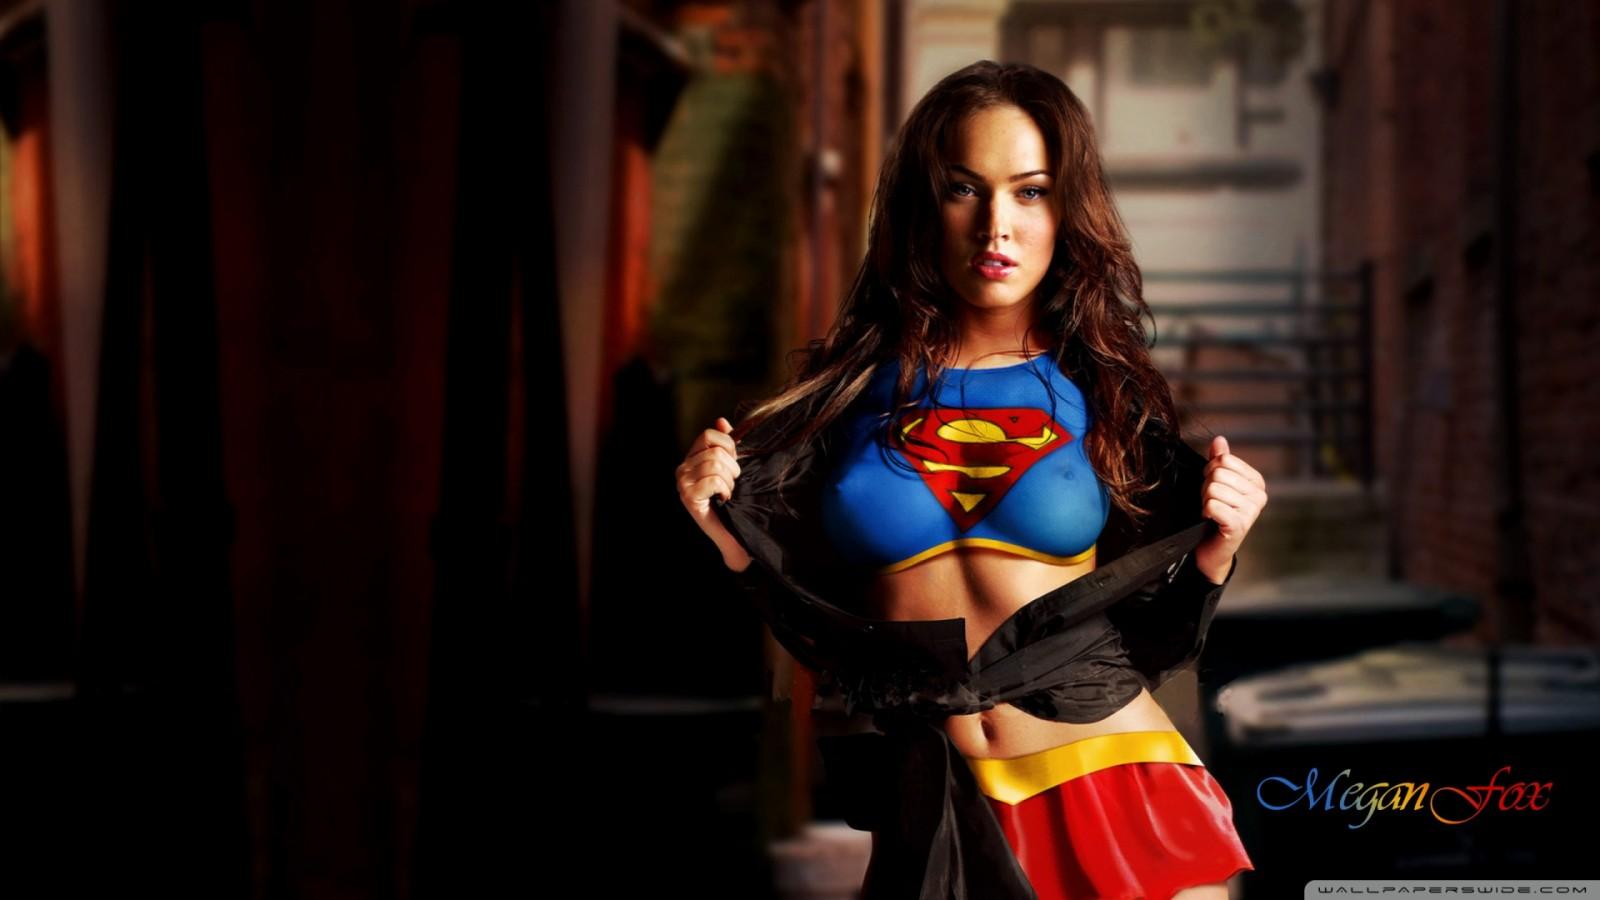 Megan Fox 2013 Superman HD Wallpaper of Celebrities   hdwallpaper2013 1600x900